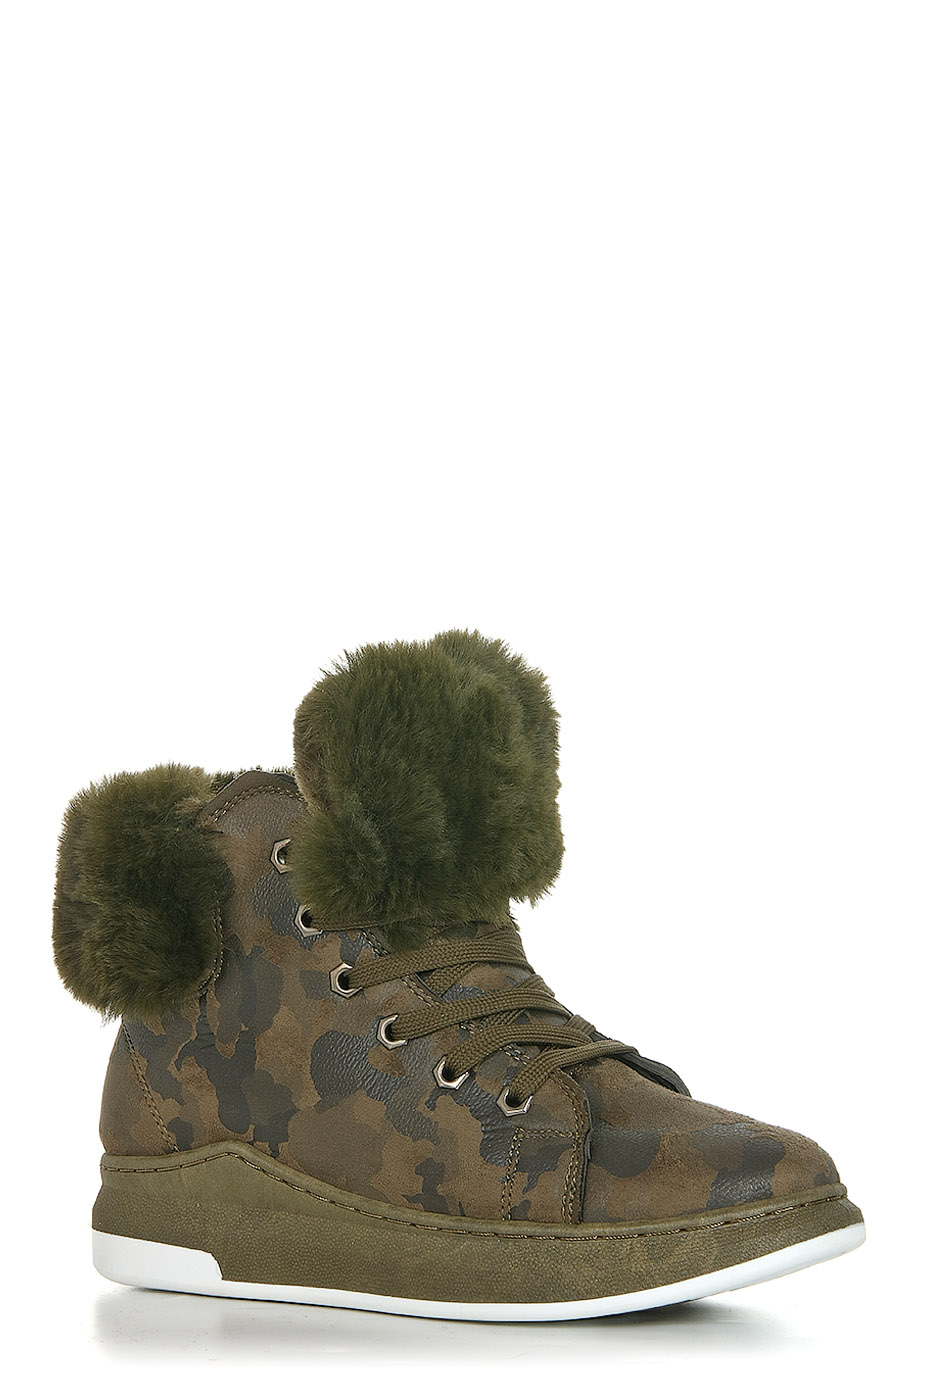 Ботинки TOPLAND2352-PB76177X/GREEN